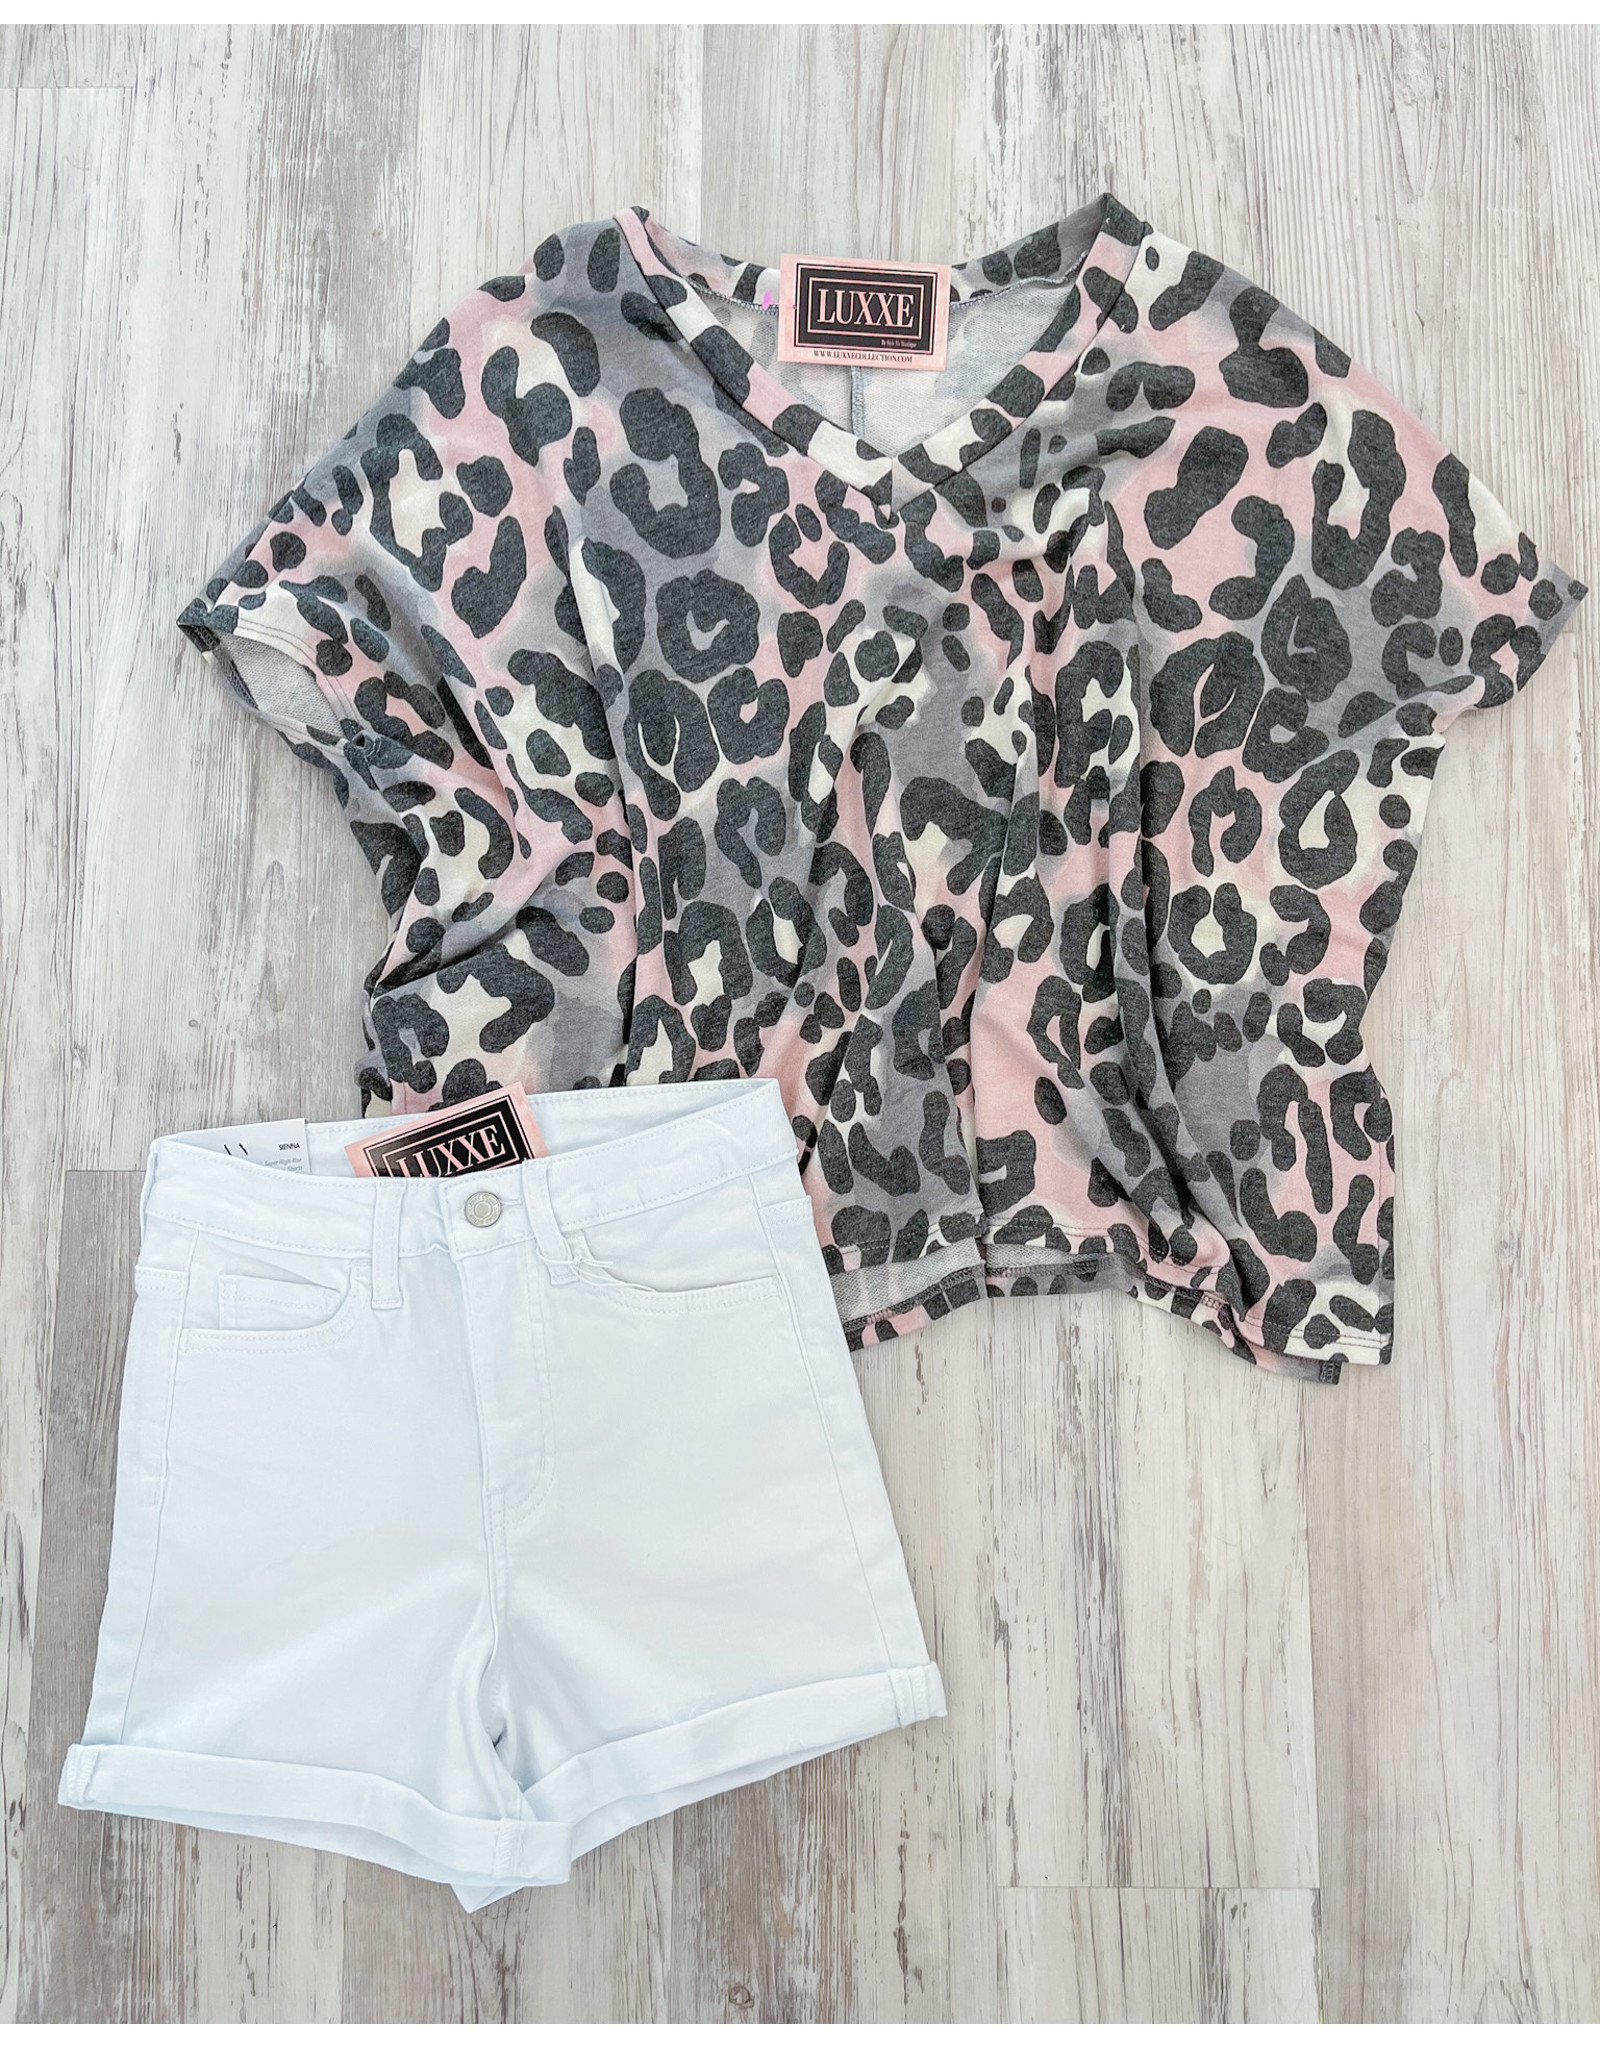 Oversized Leopard Top - Grey